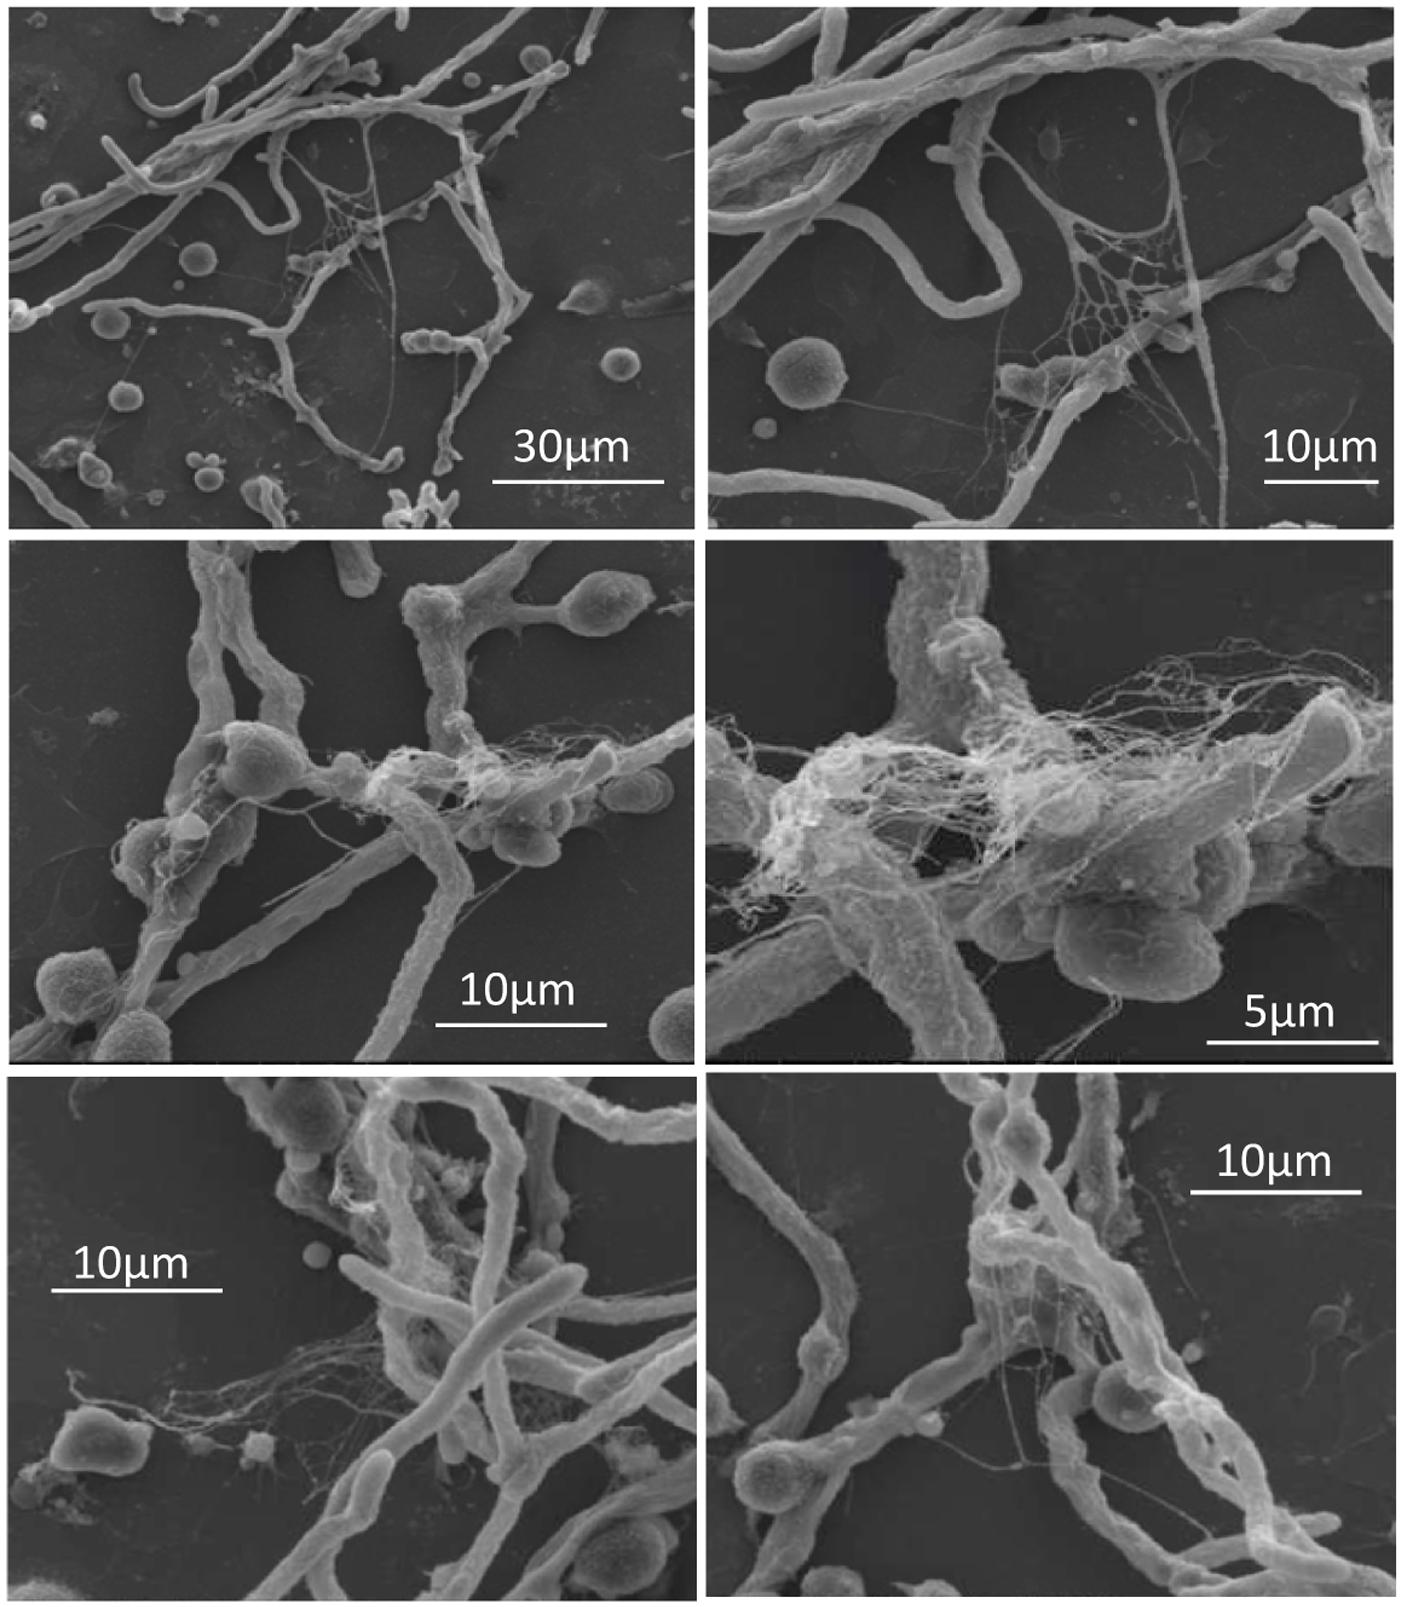 Scanning electron microscopy of pDCs incubated with <i>A</i>. <i>fumigatus</i> hyphae.